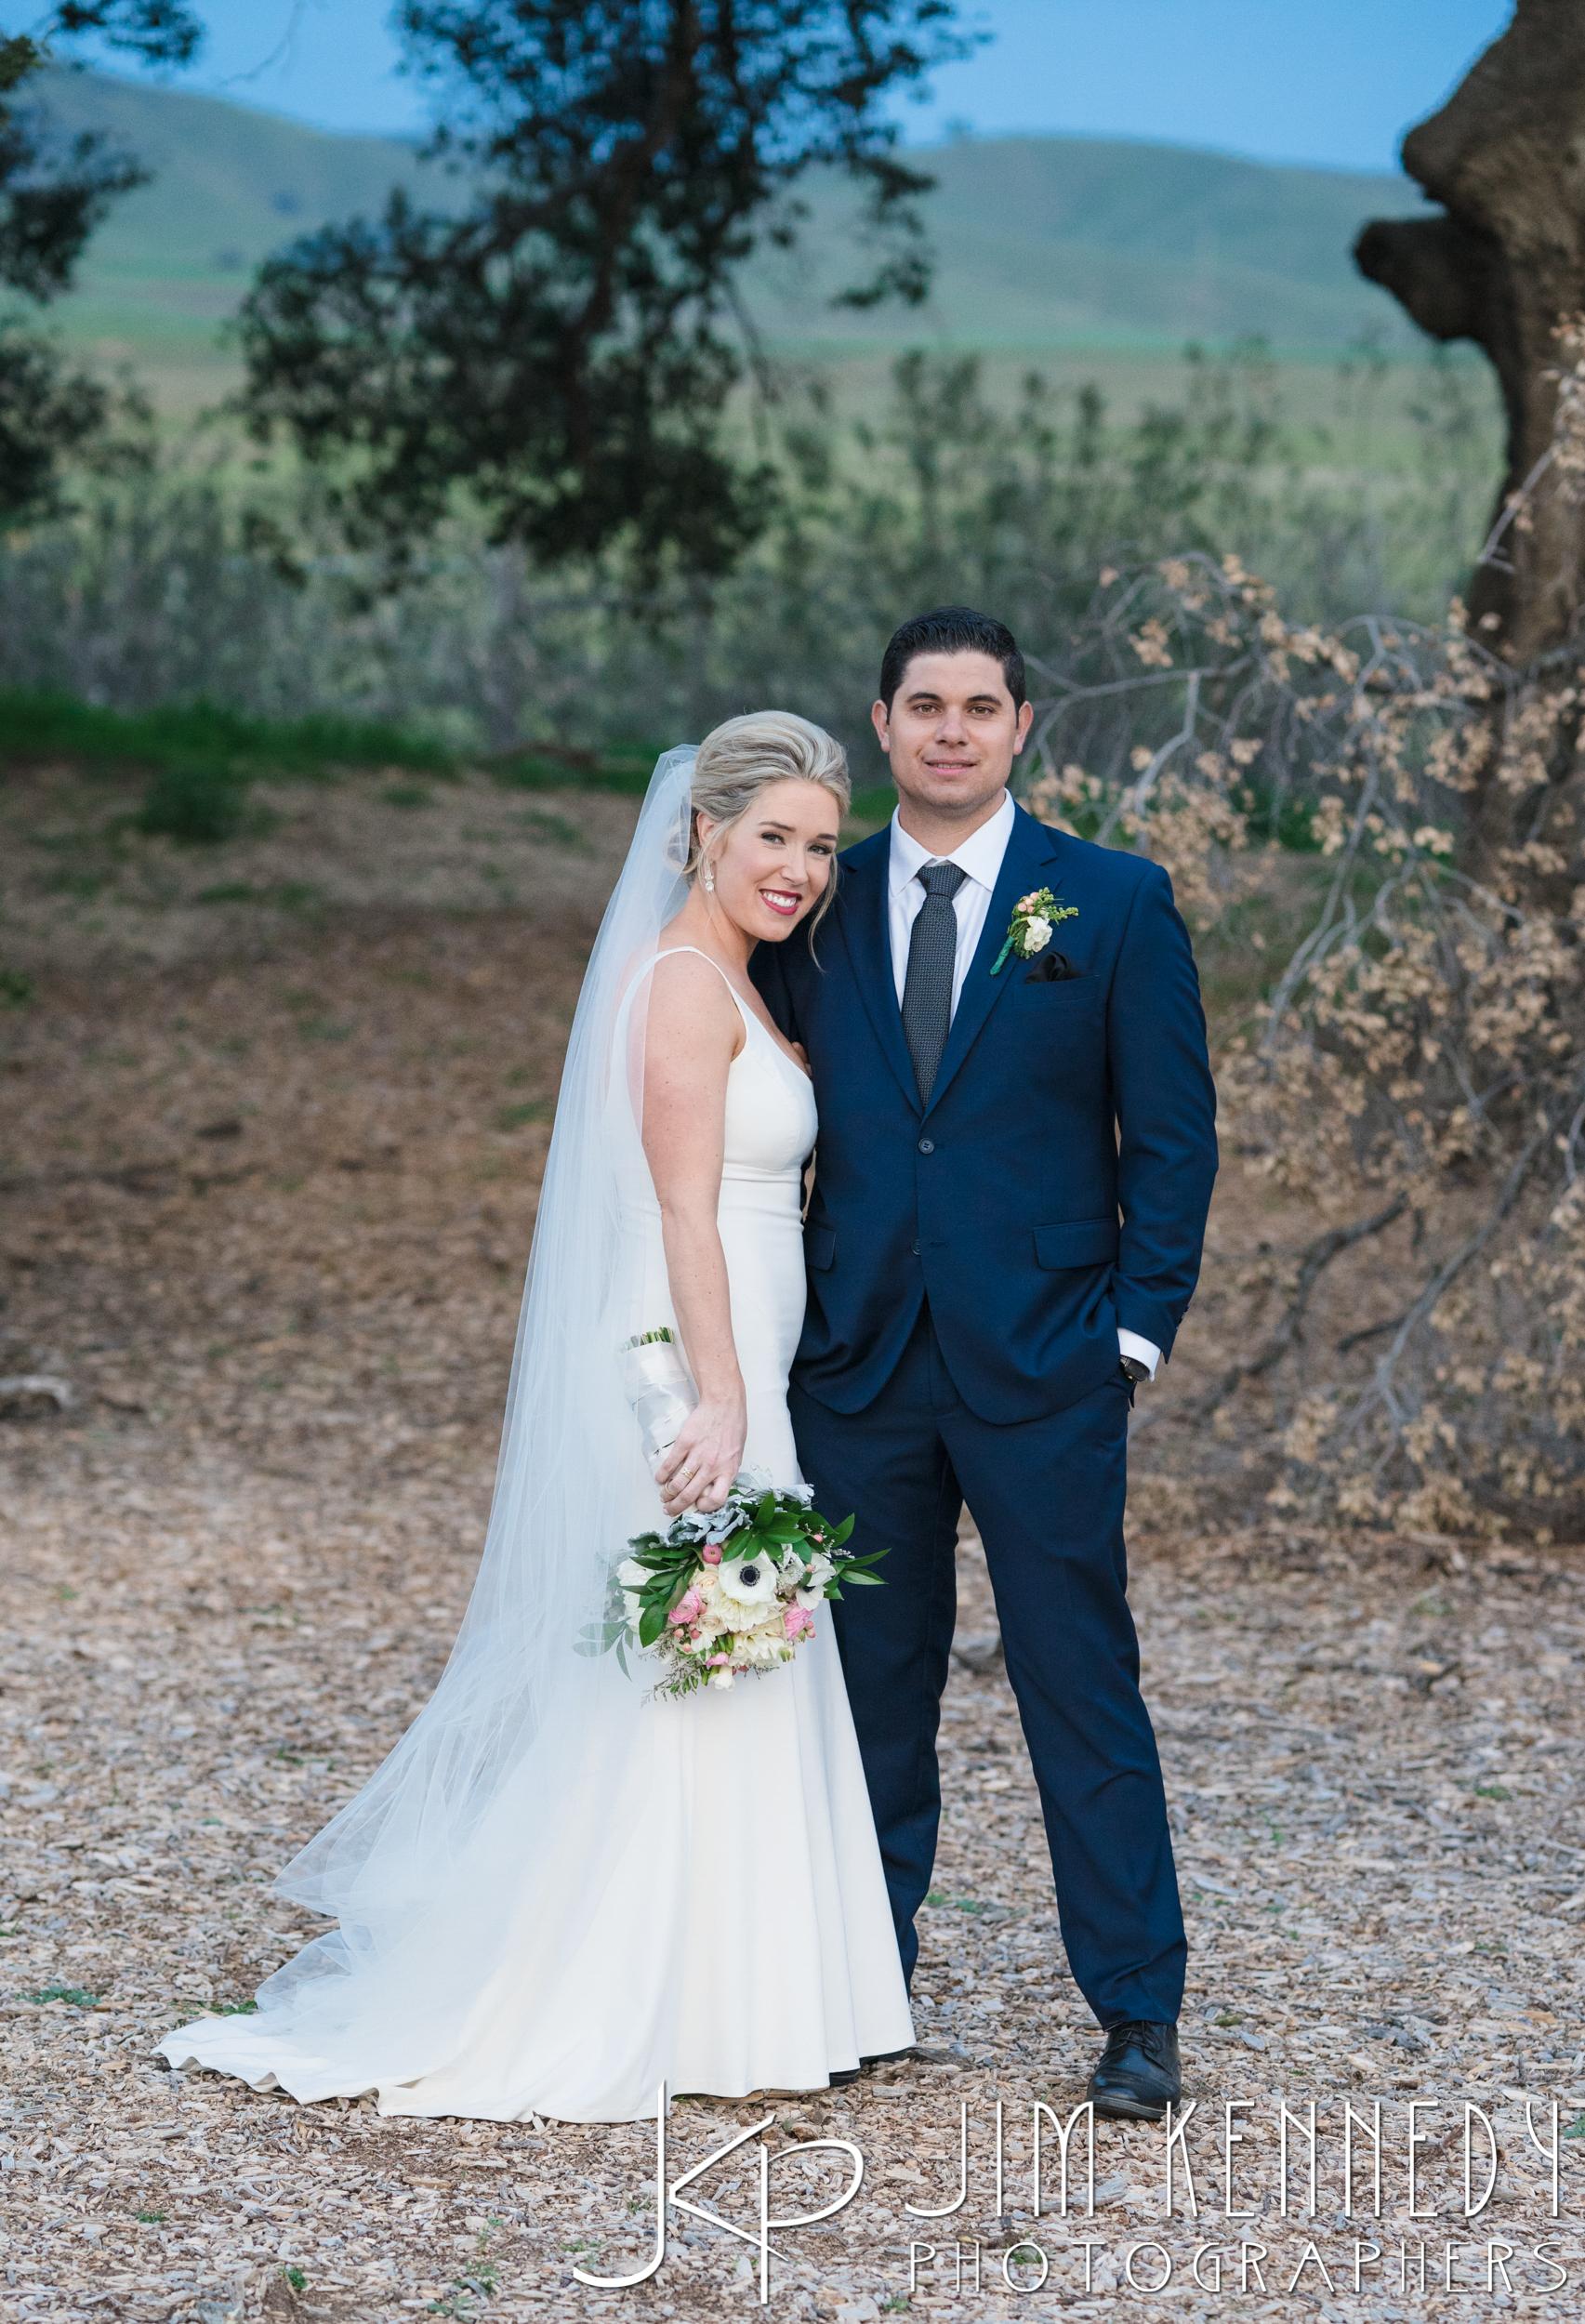 jim_kennedy_photographers_highland_springs_wedding_caitlyn_0149.jpg